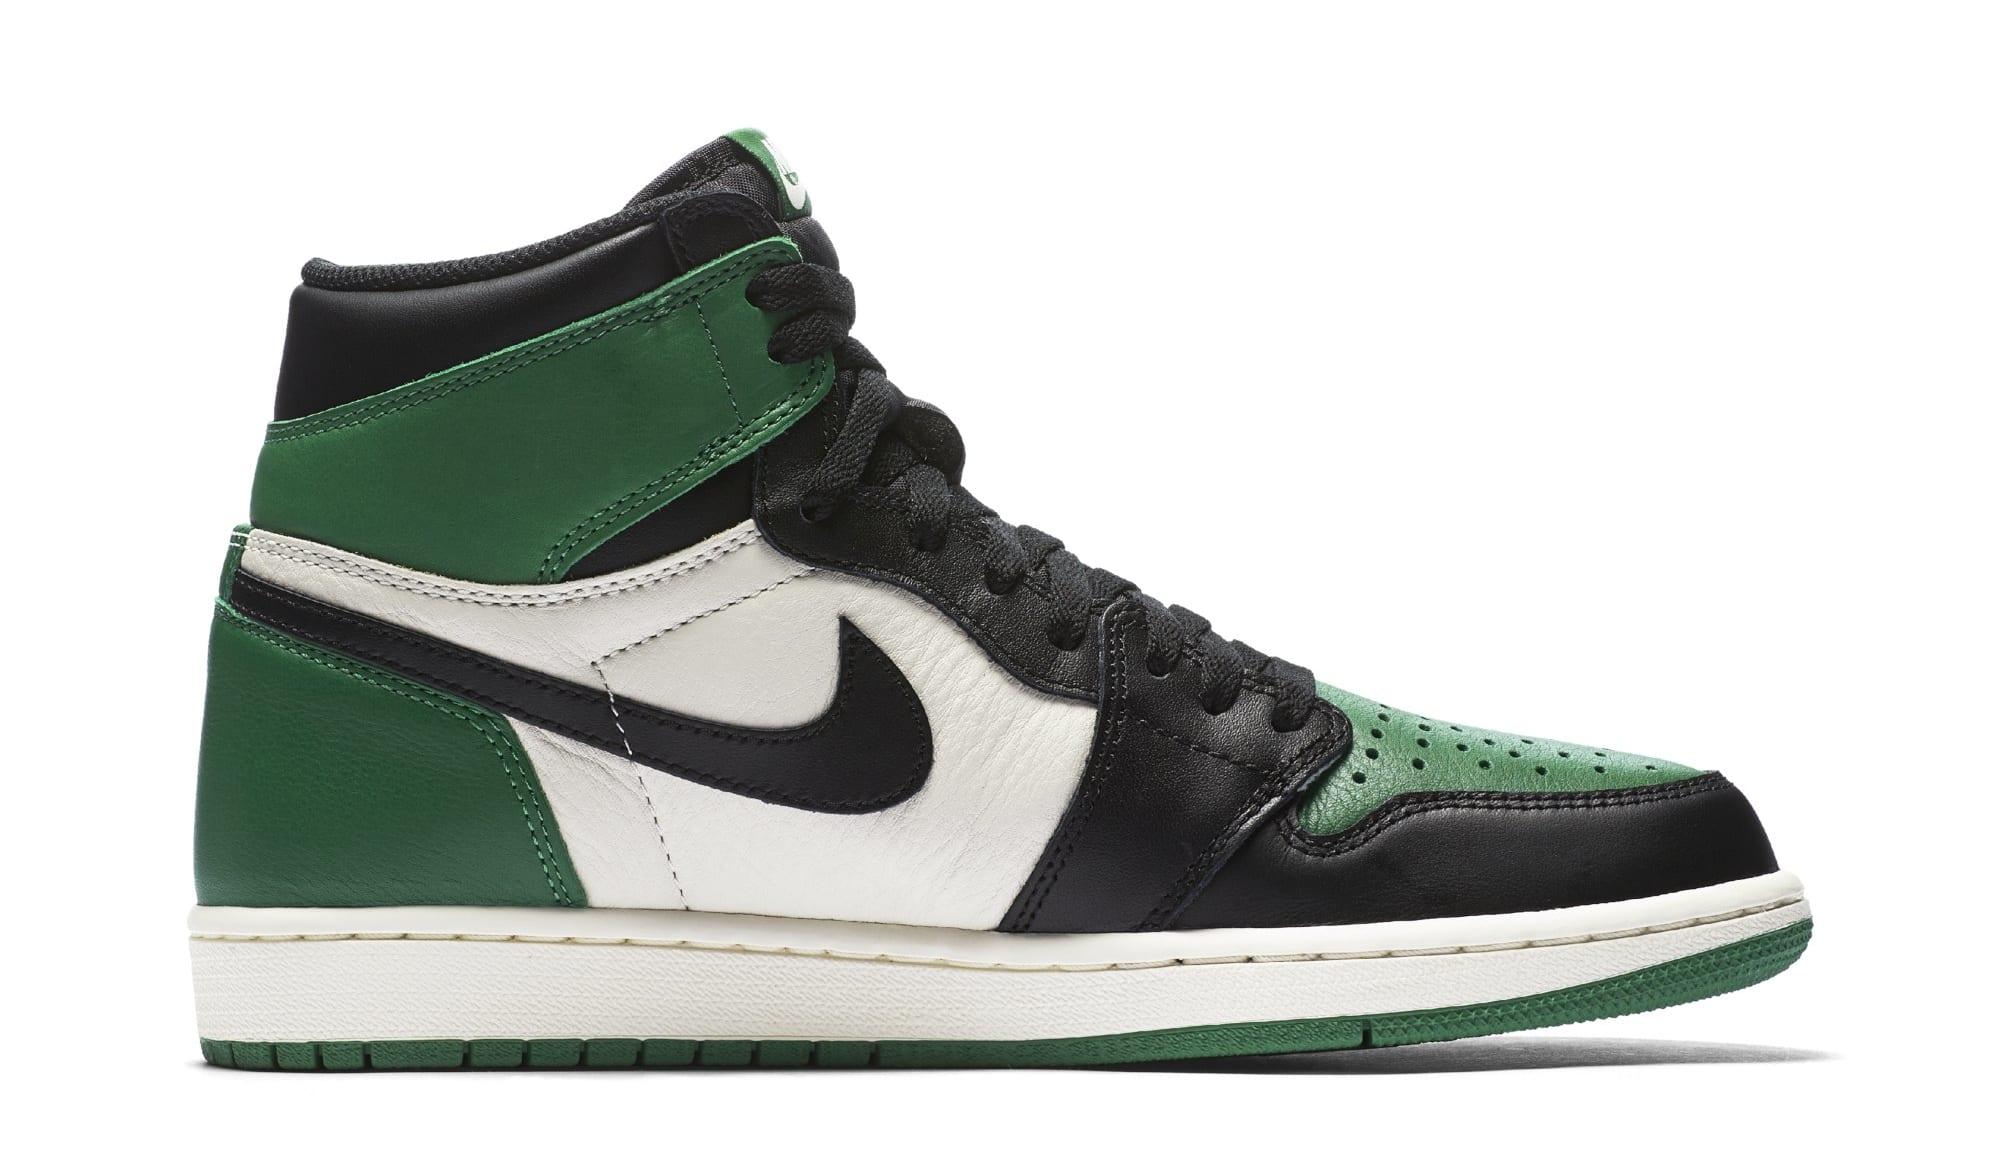 Air Jordan 1 High OG 'Pine Green' 555088-032 (Lateral)